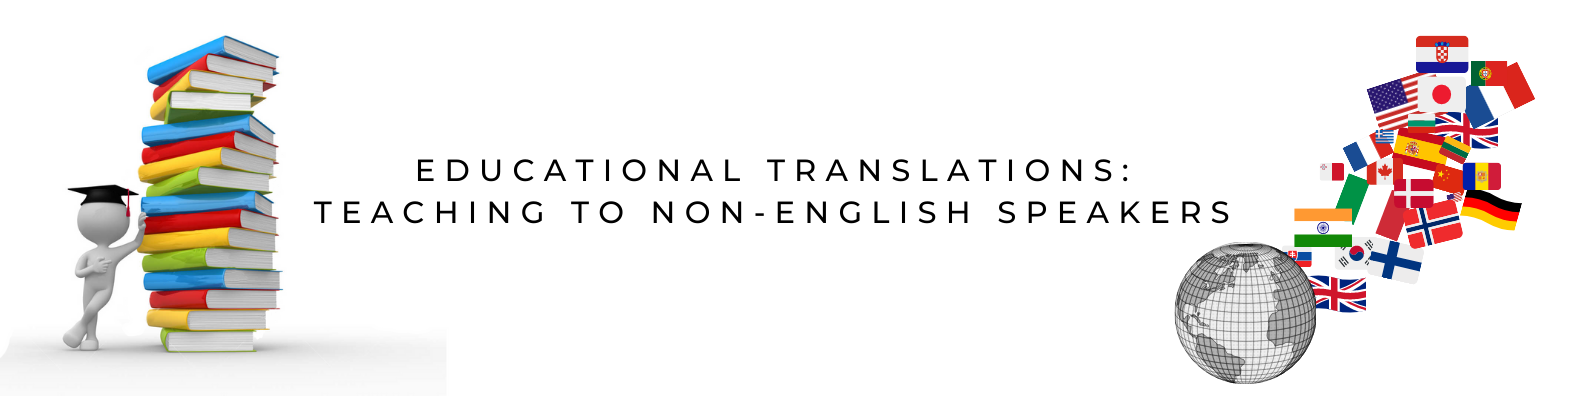 educational translations